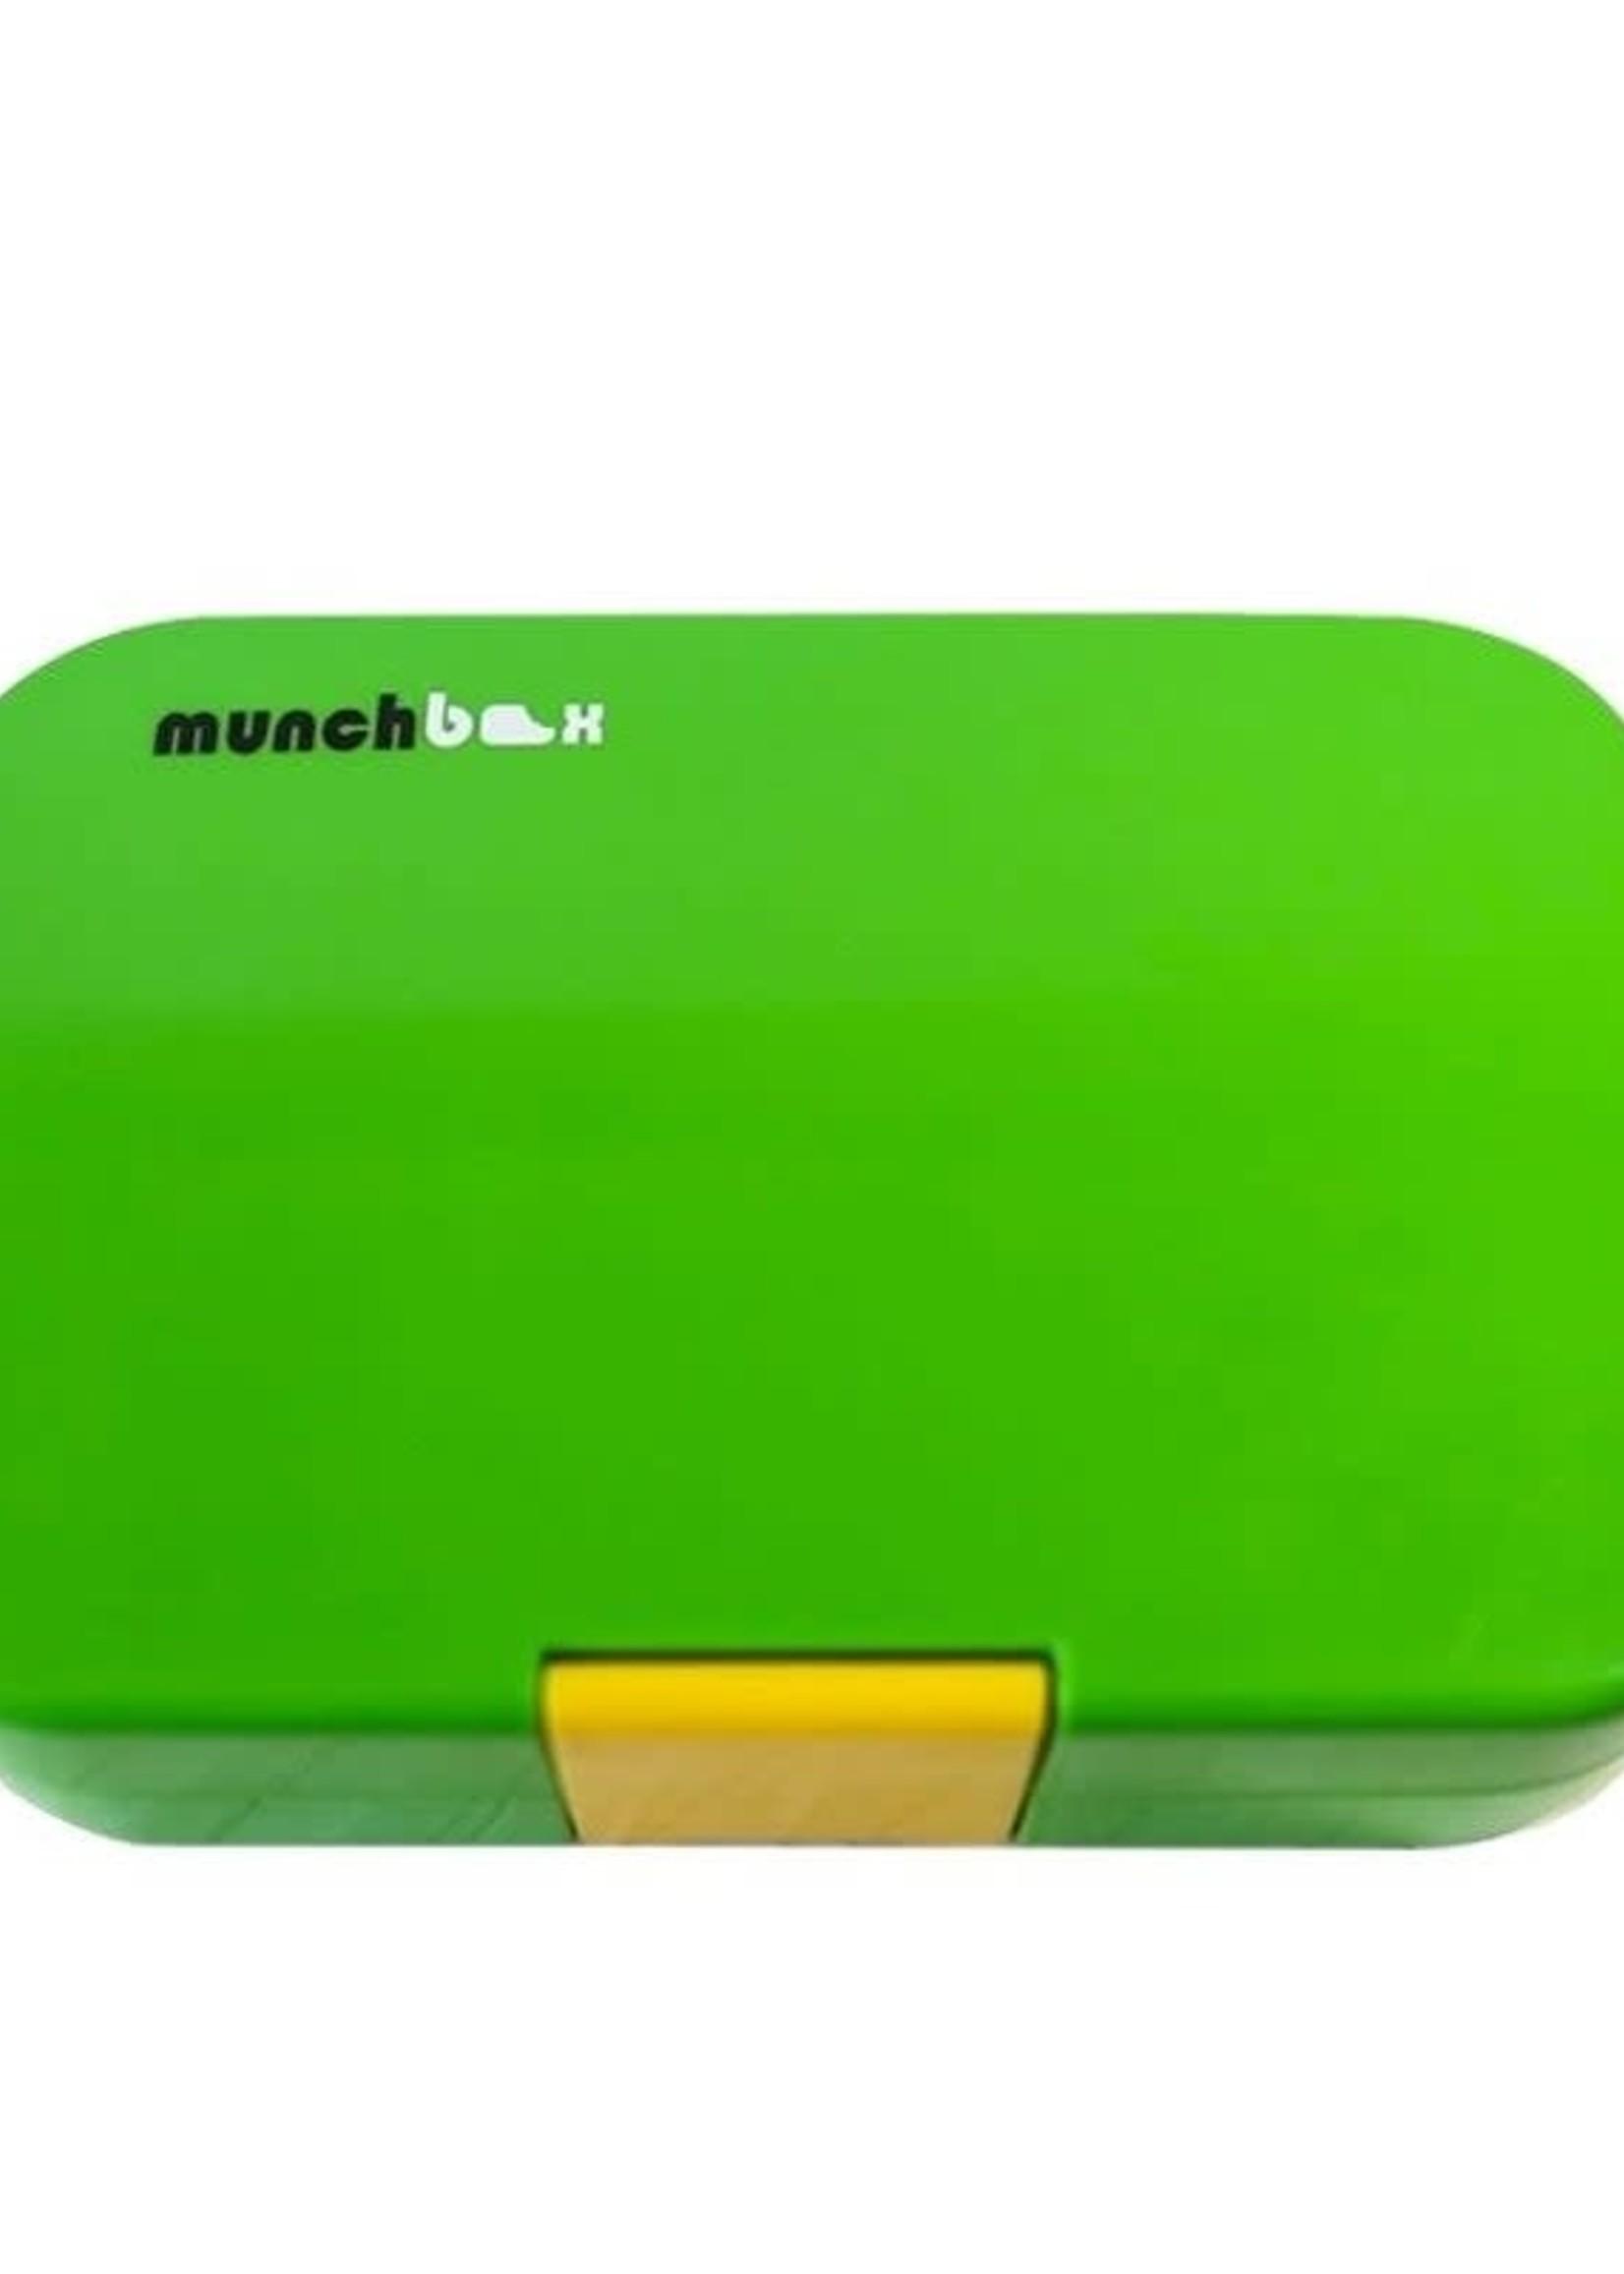 zoli Munchbox Maxi 6 (Green Jungle)